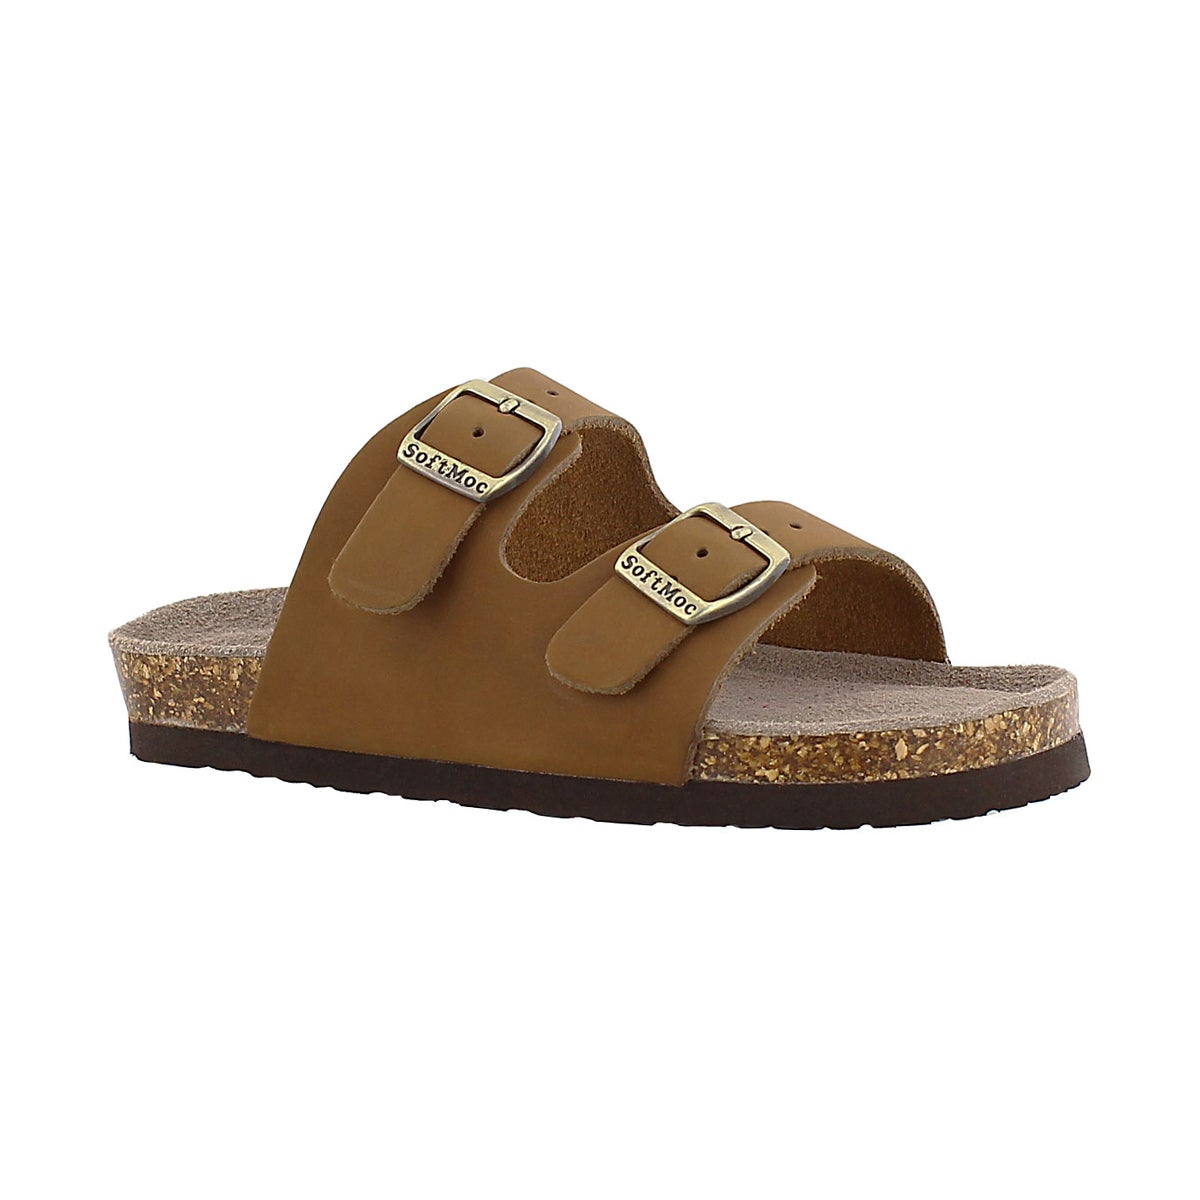 Sandale à enfiler Aurora 2, havane, enf